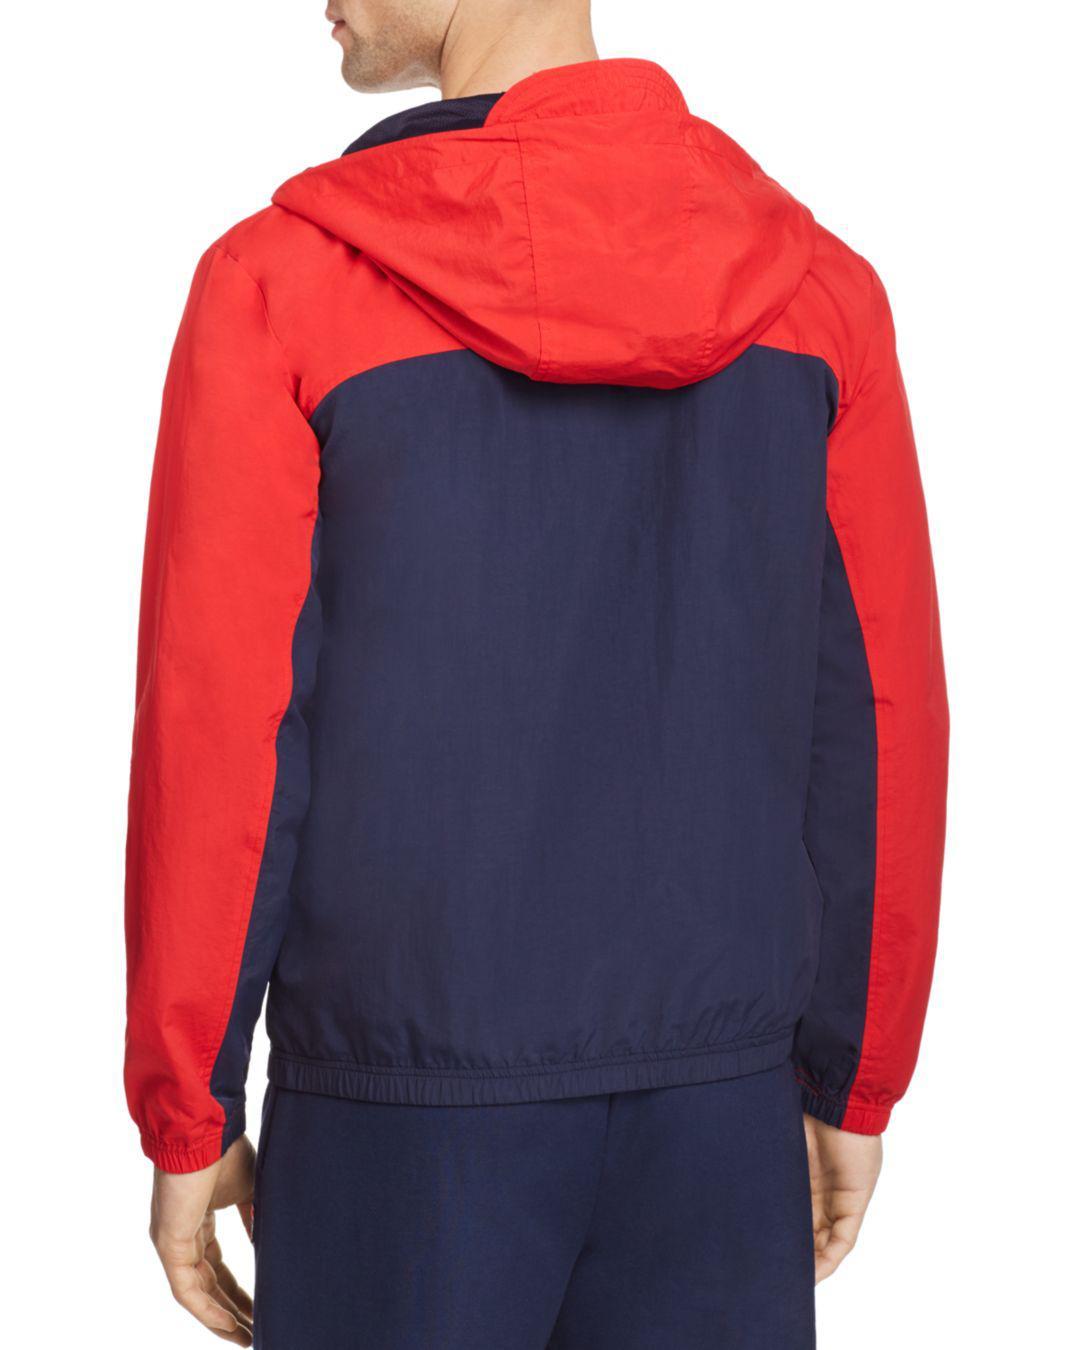 Fila Clipper Hooded Jacket in Red for Men